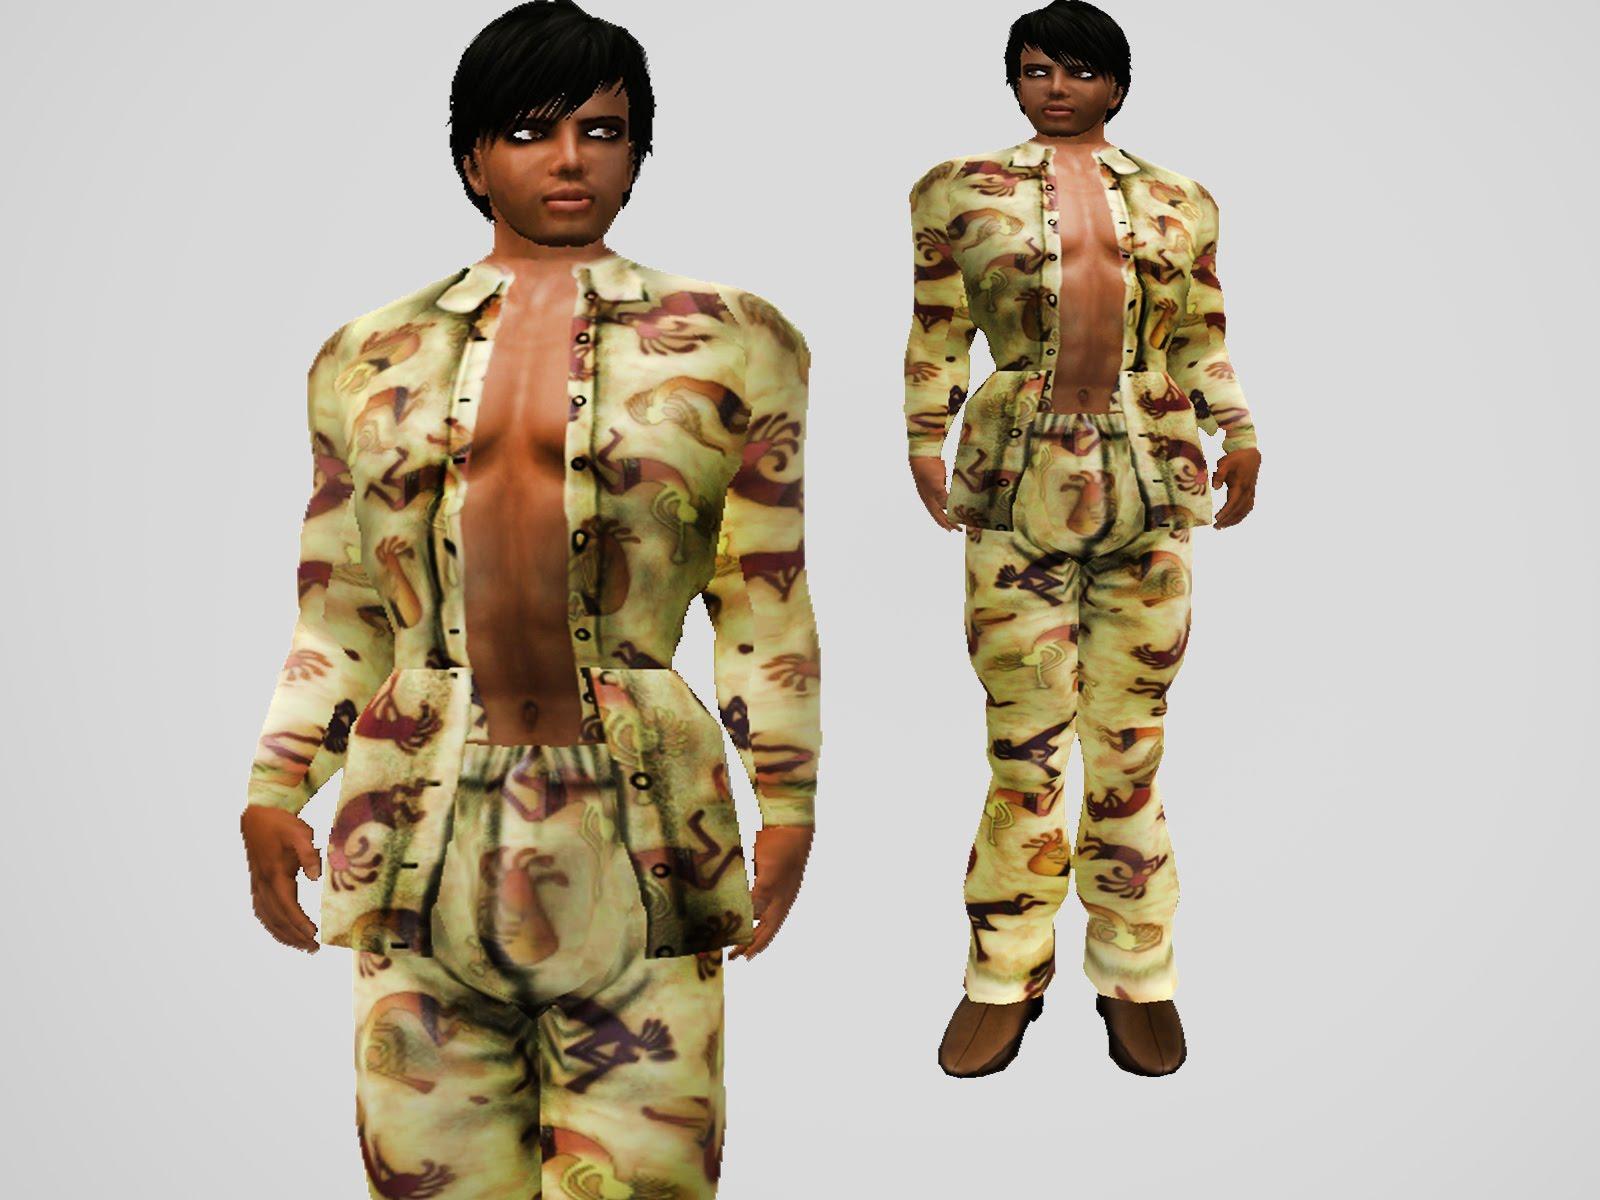 http://3.bp.blogspot.com/_GX-odXWZvh4/SwnHJ3JURSI/AAAAAAAABv0/WfLCnL1C3YY/s1600/man+fashion+show_001.jpg